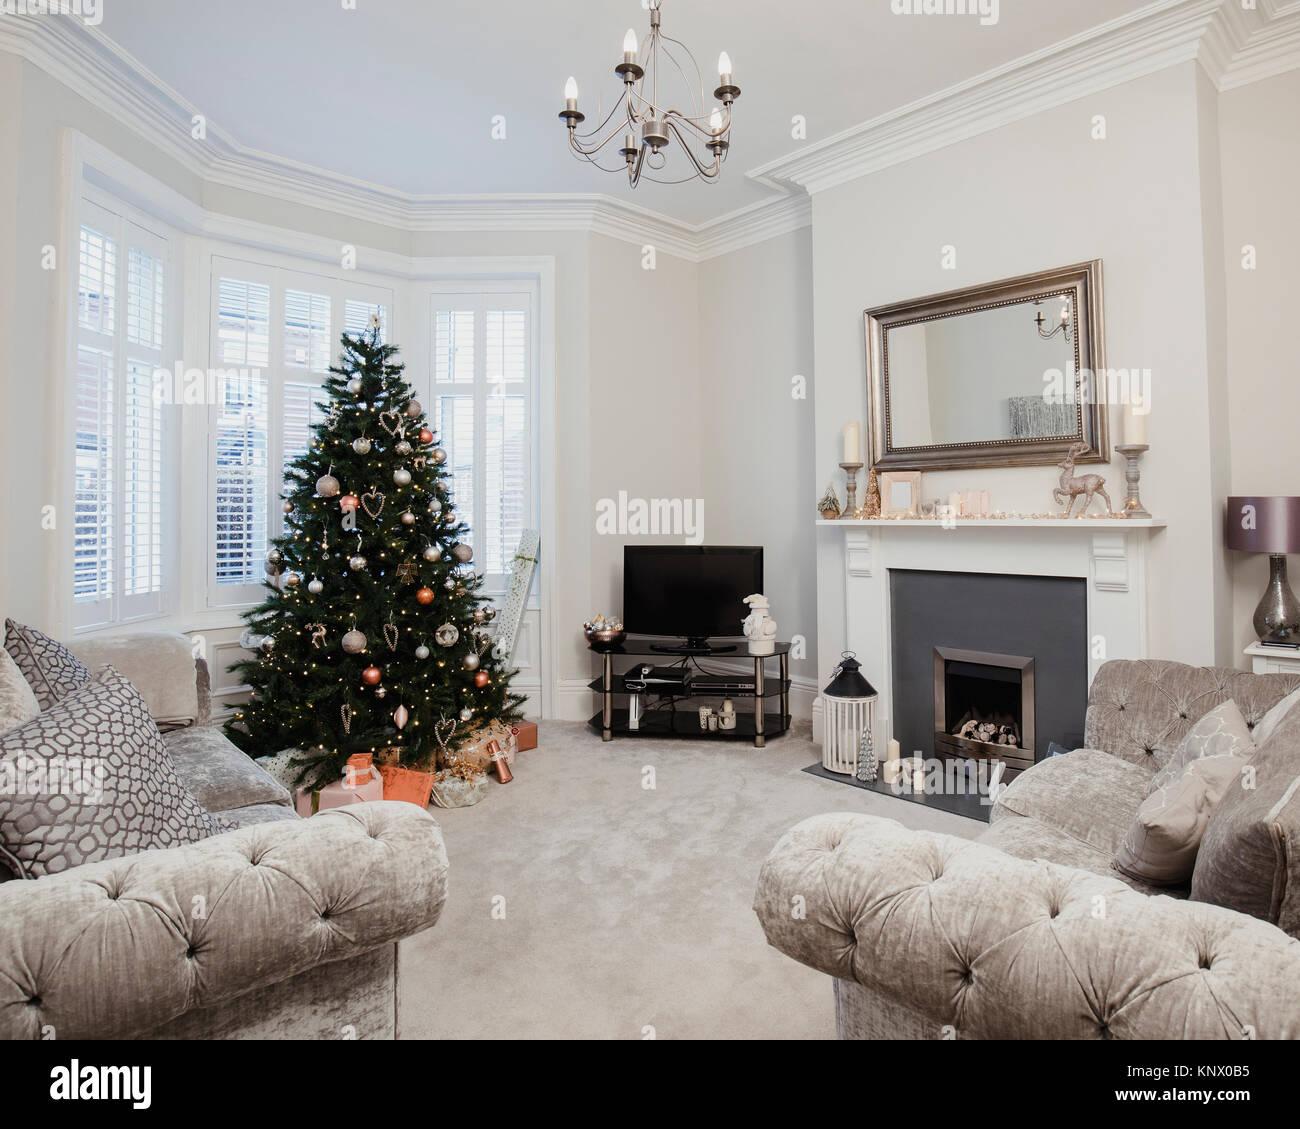 Empty Living Room: Christmas Tv Living Room Stock Photos & Christmas Tv